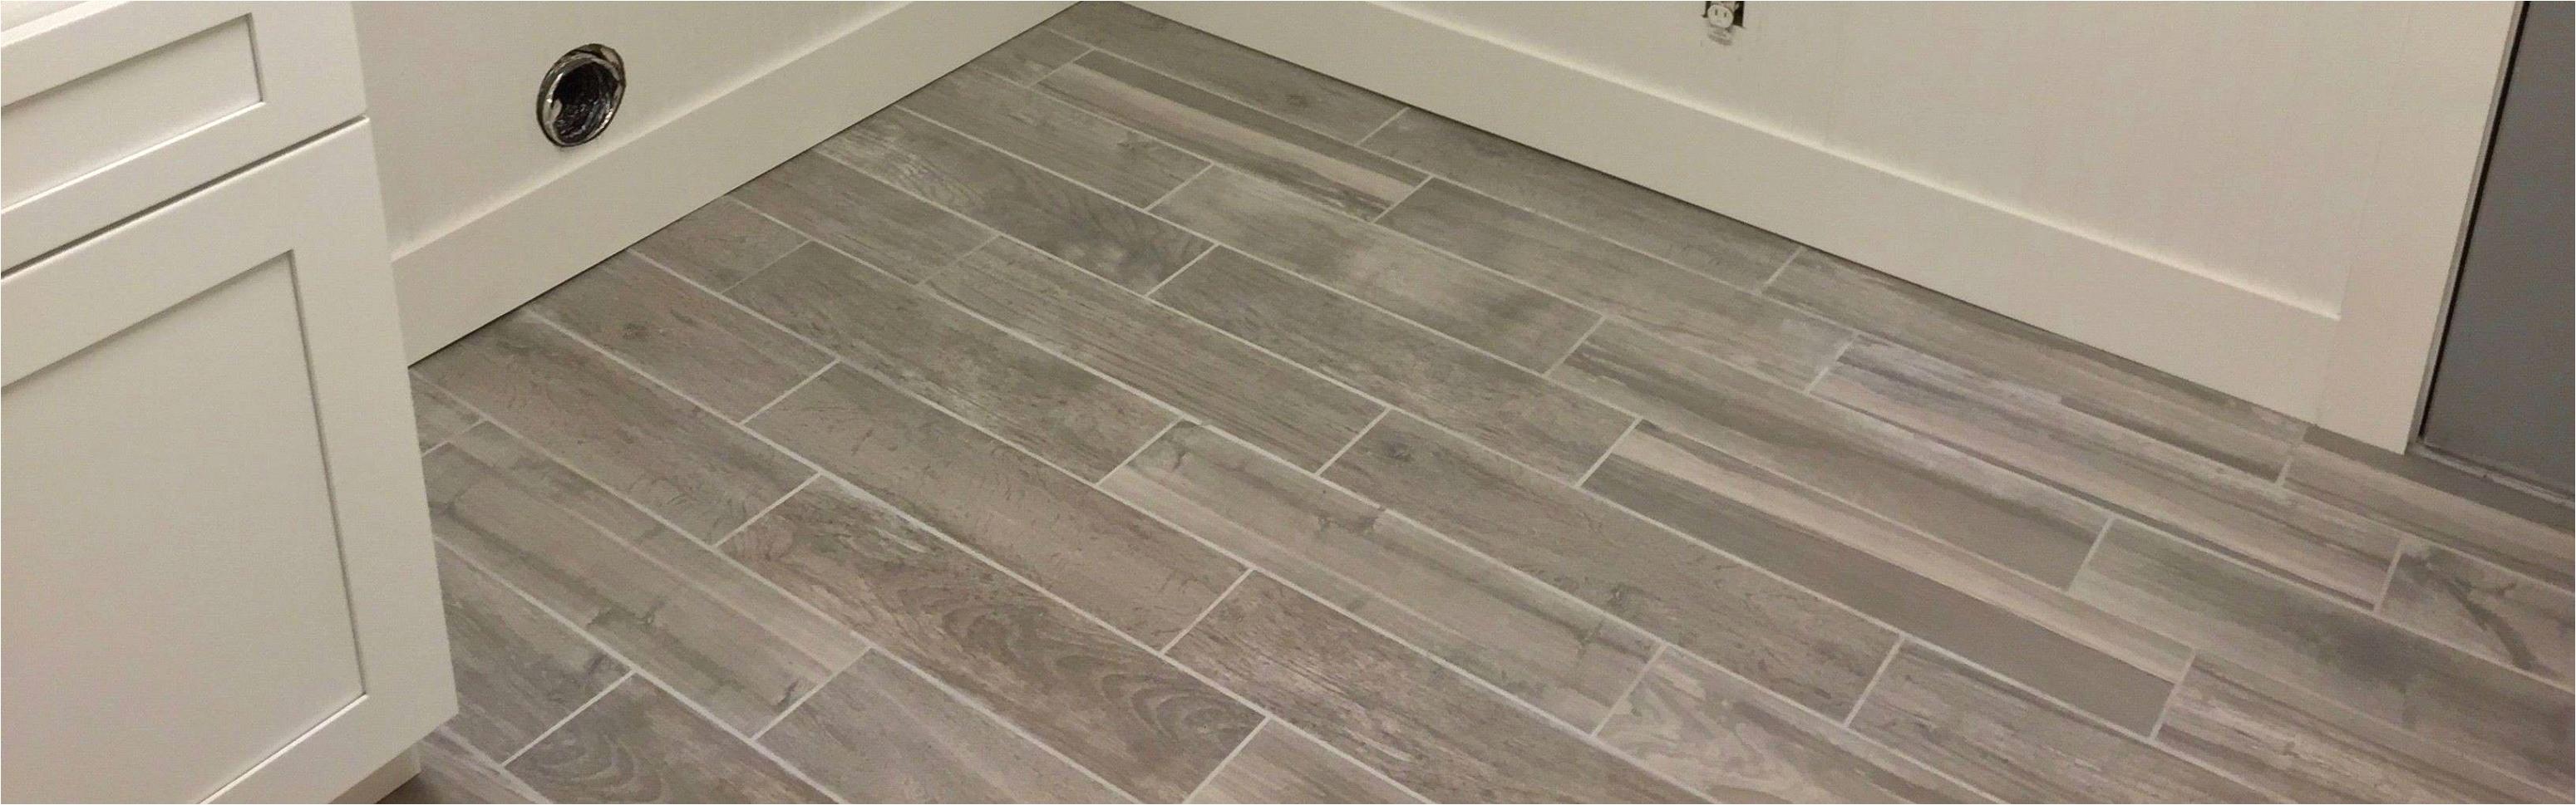 flooring supplies bathroom floor drain installation beautiful unique bathroom tiling